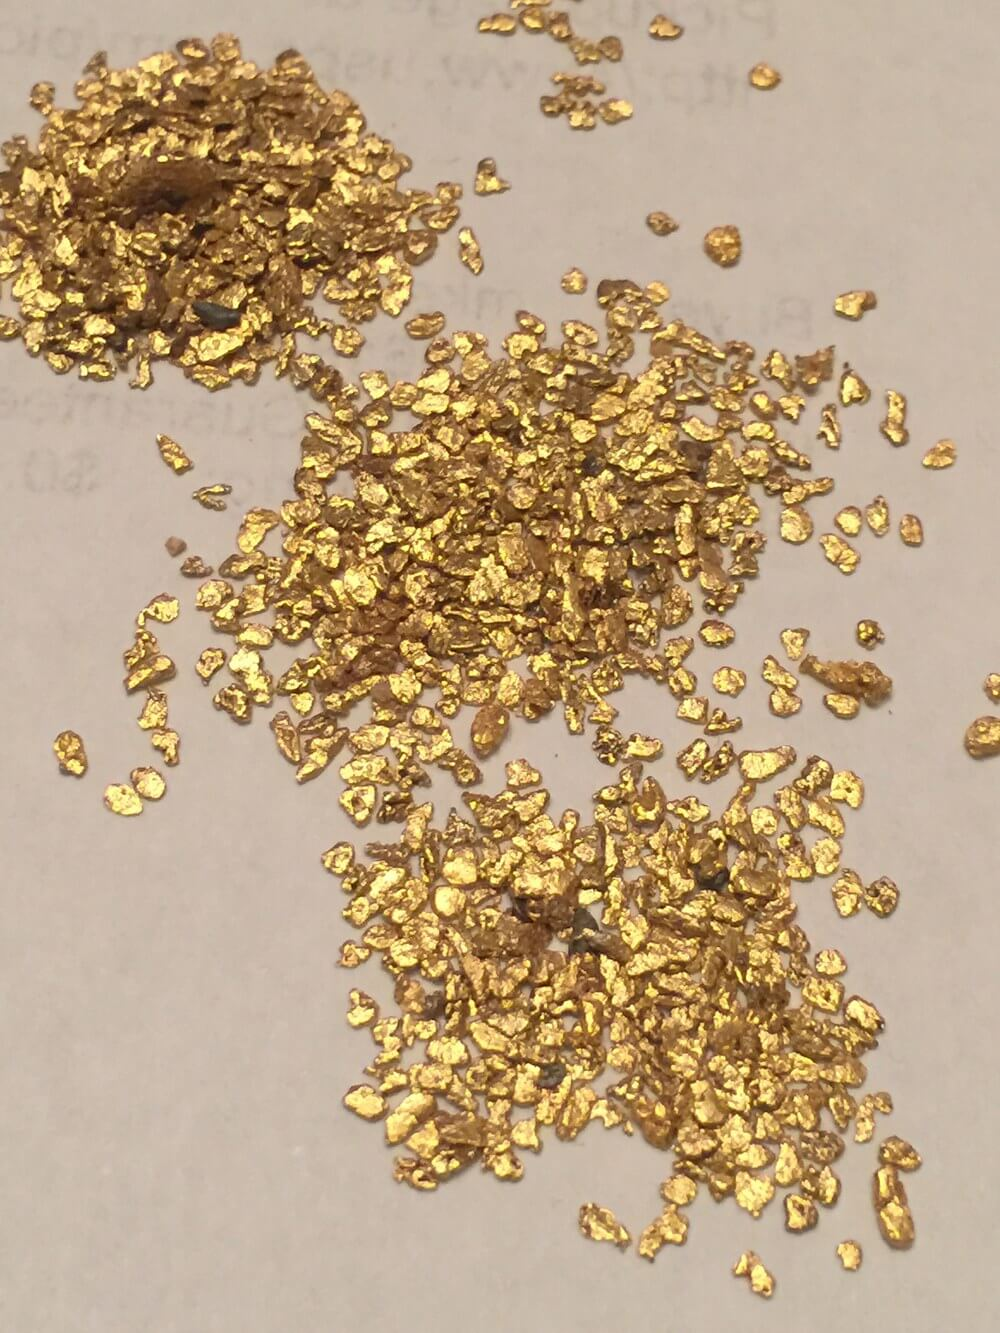 Lynch+Mining+Gold+Paydirt+Pickers.jpg